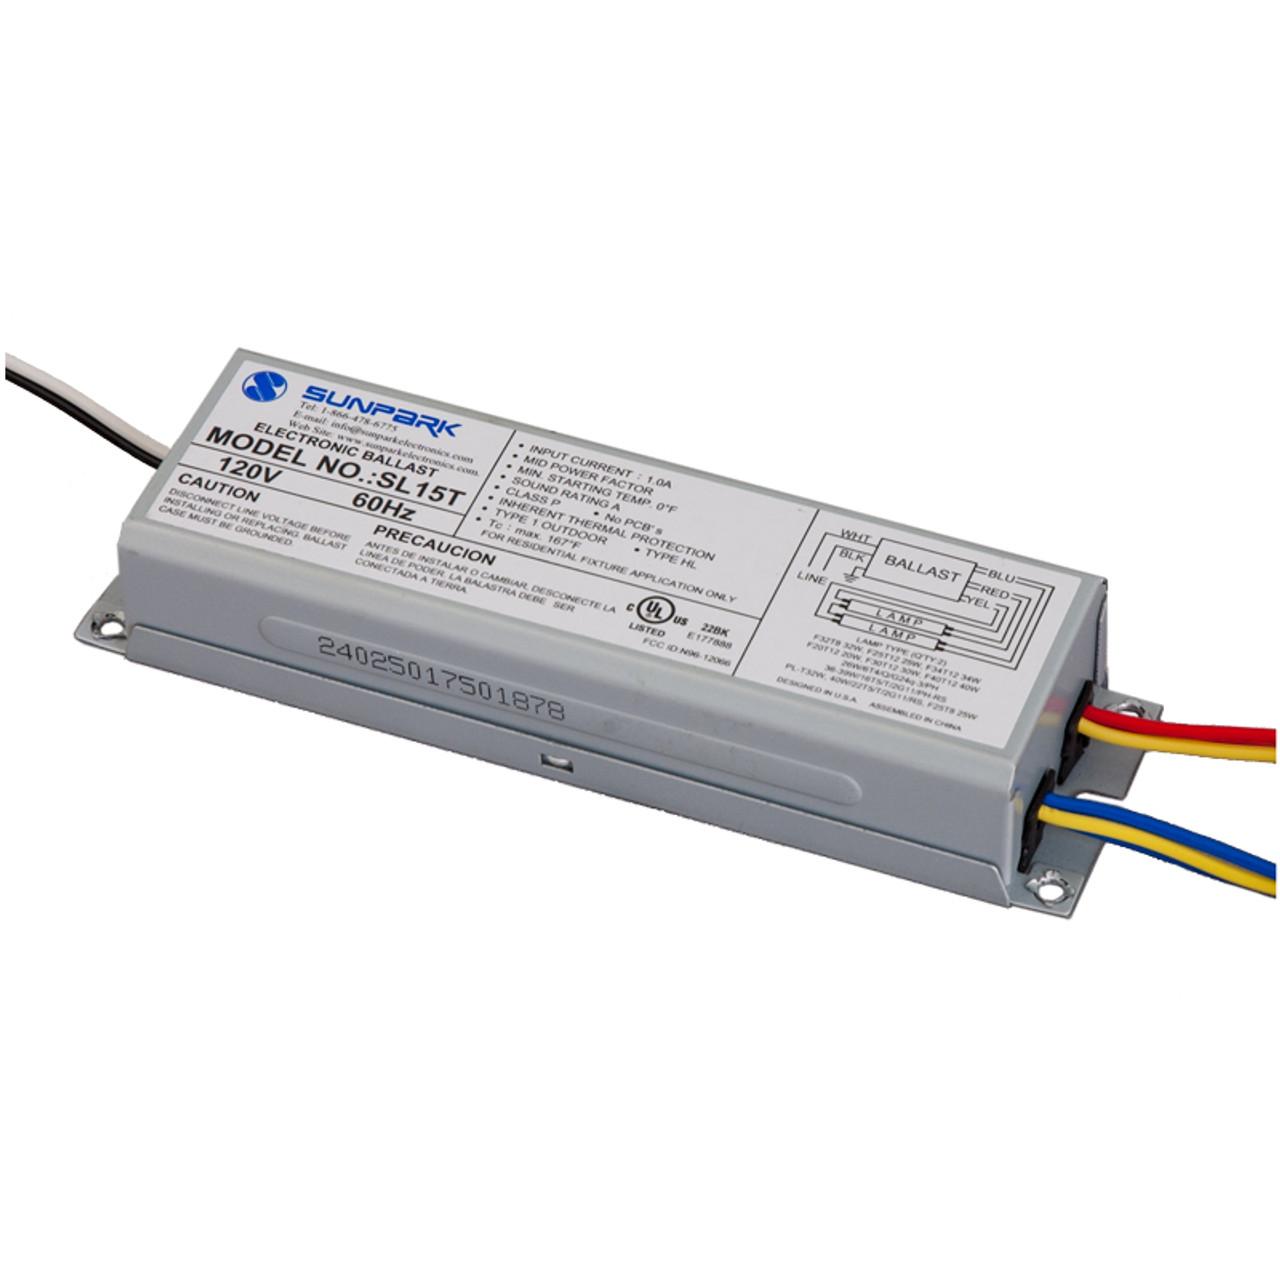 medium resolution of sunpark sl15t electronic replacement ballast sunpark sl15t ballast wiring diagram